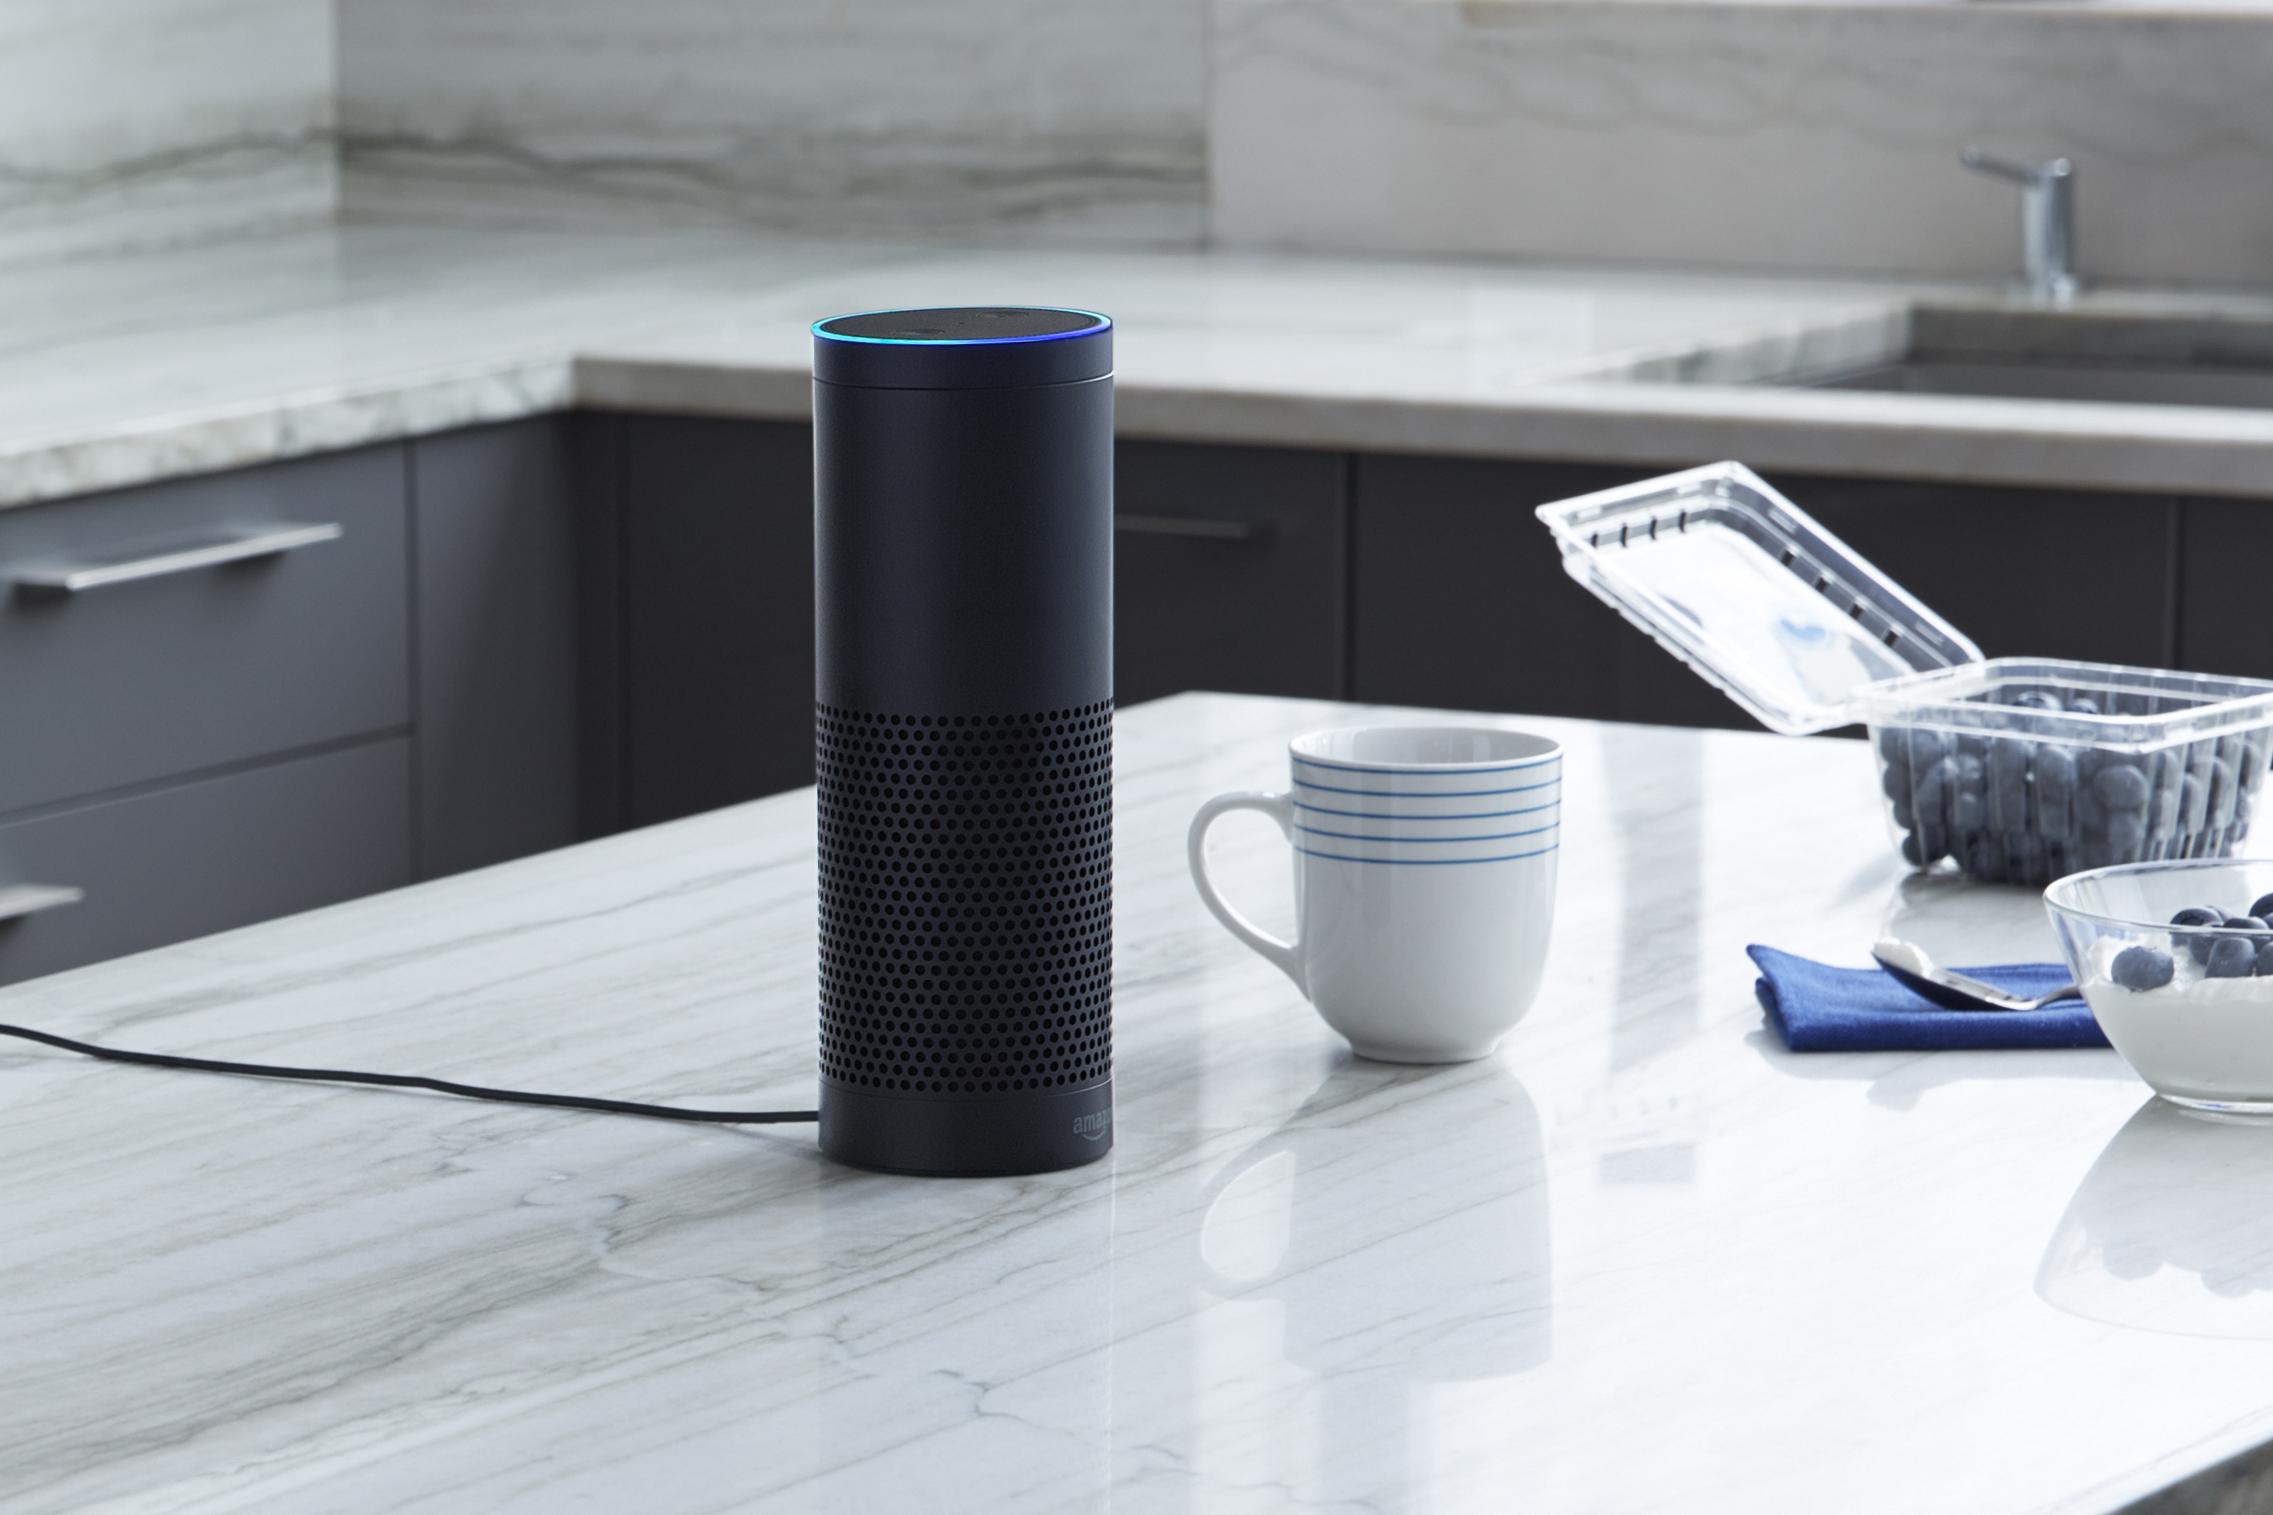 An Amazon Echo speaker sitting on countertop.